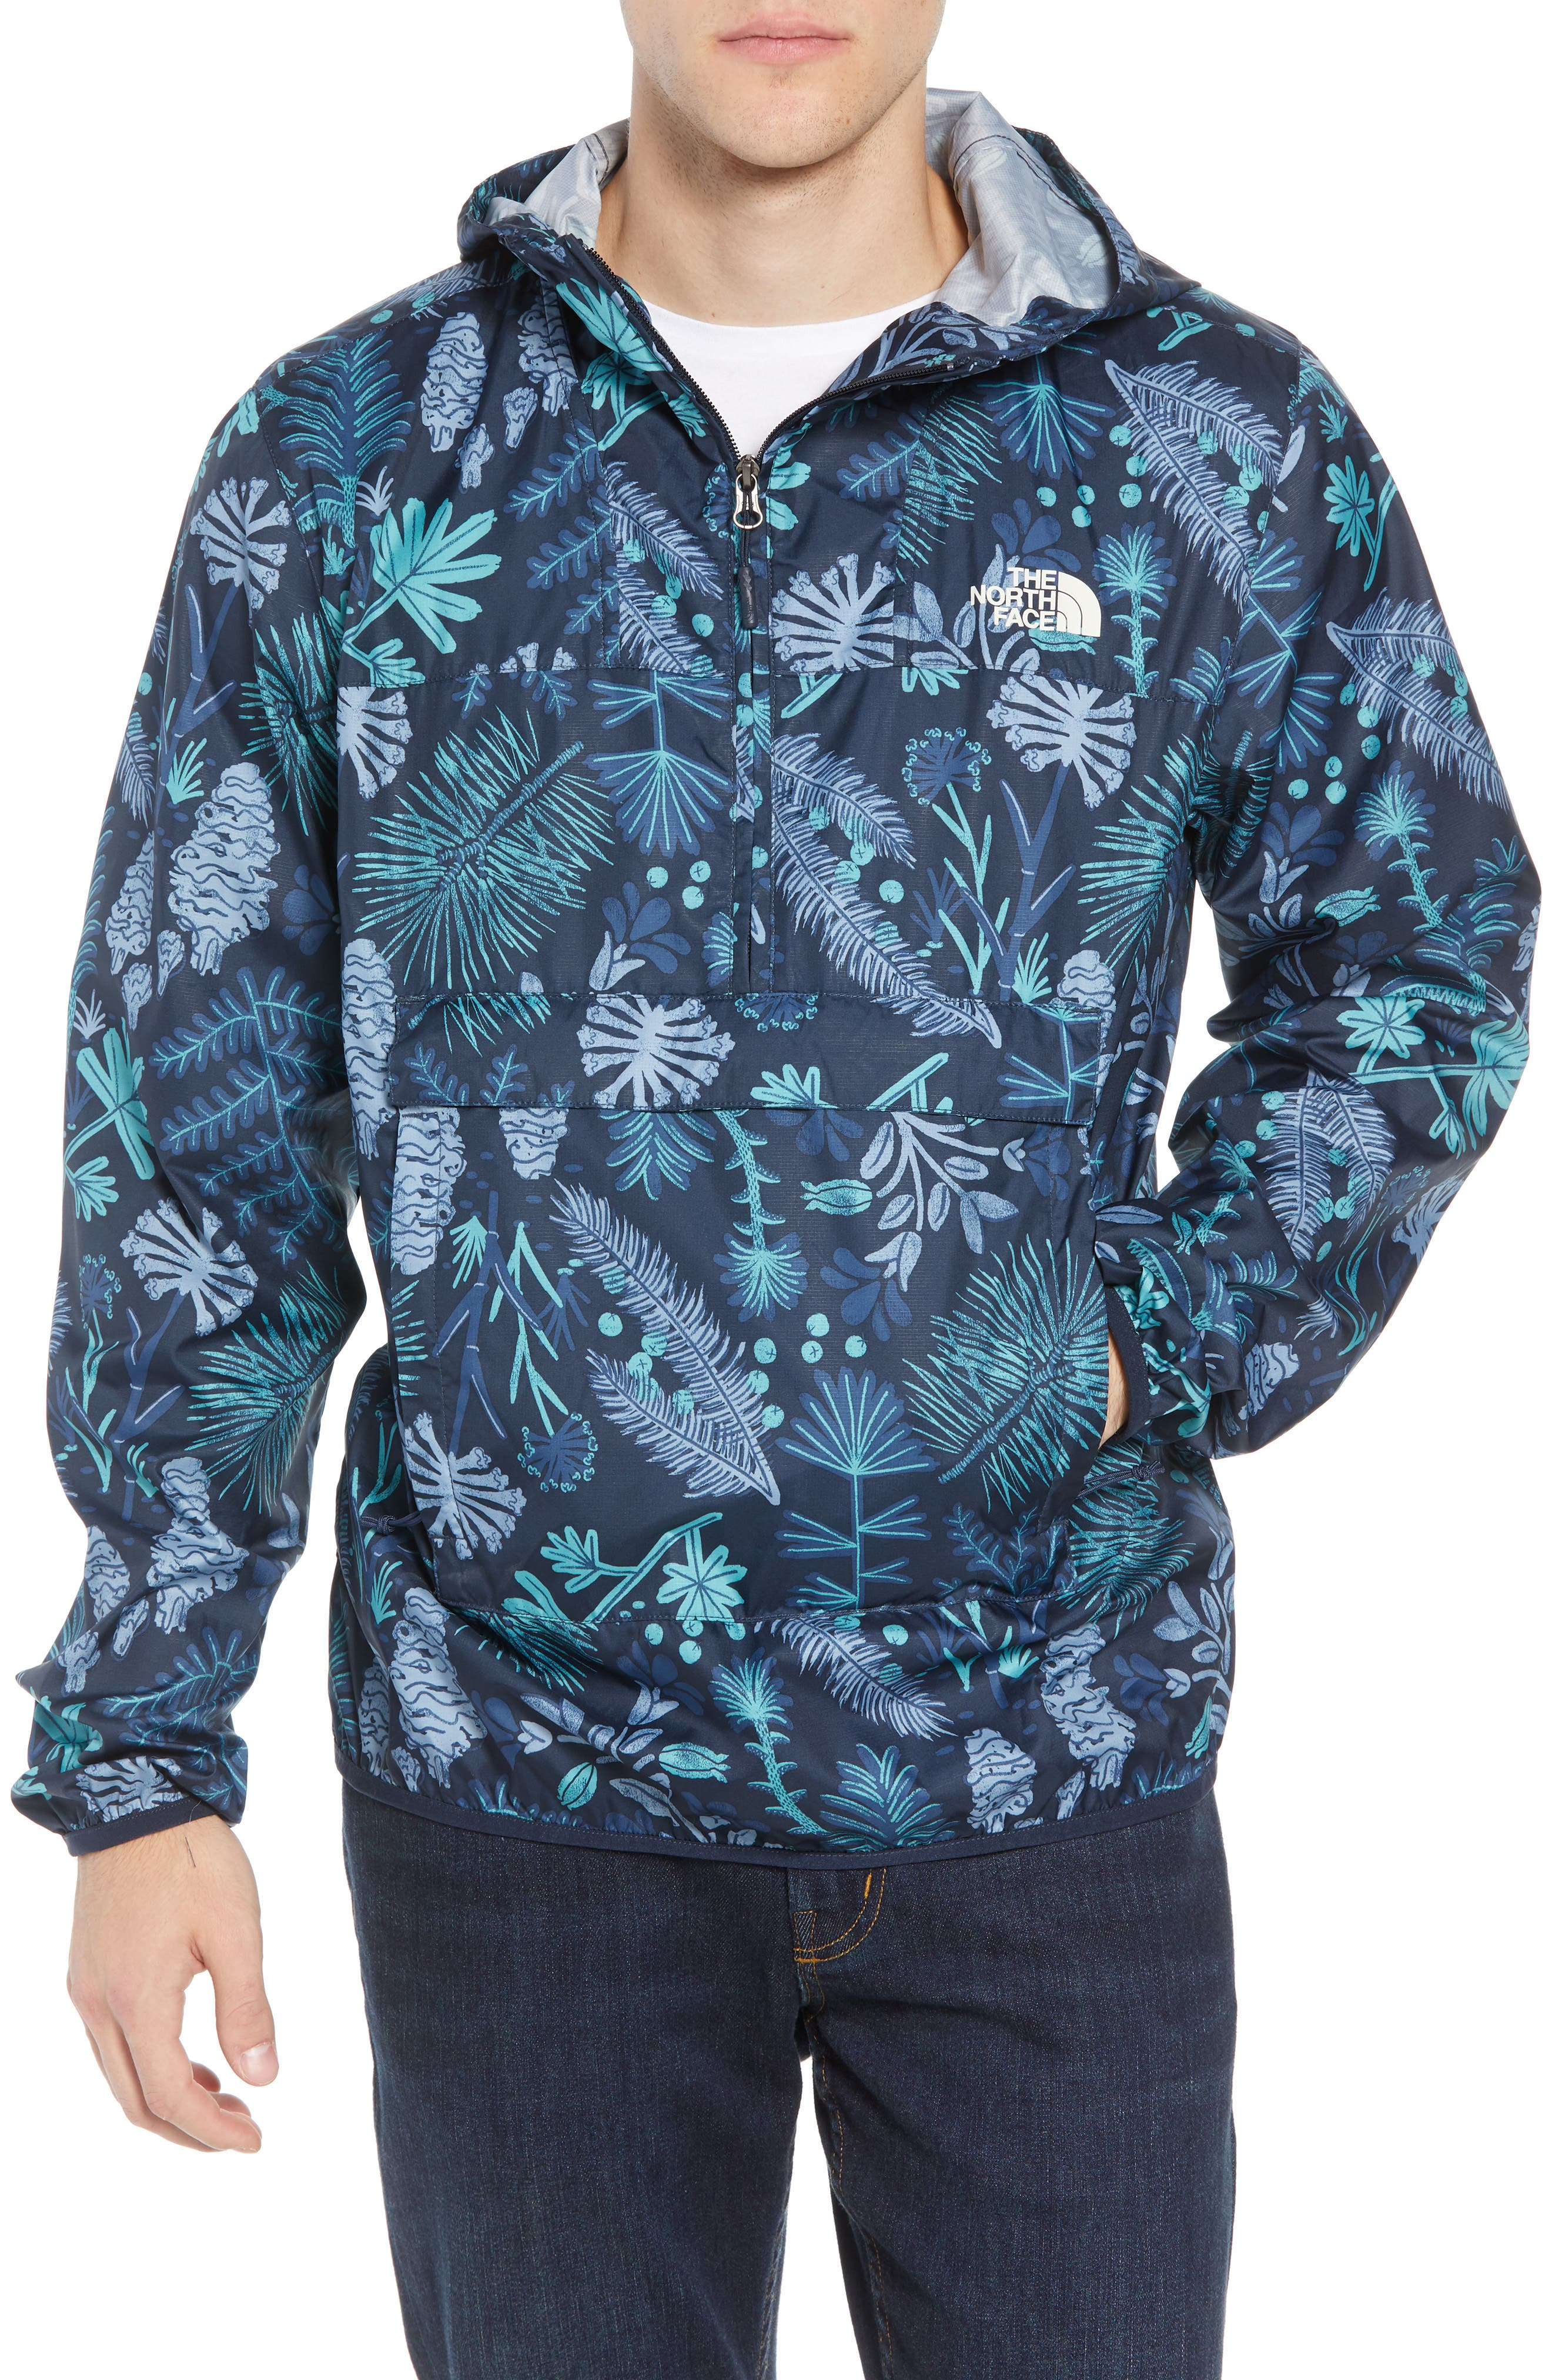 Fanorak Pullover, Main, color, URBAN NAVY WOODLAND